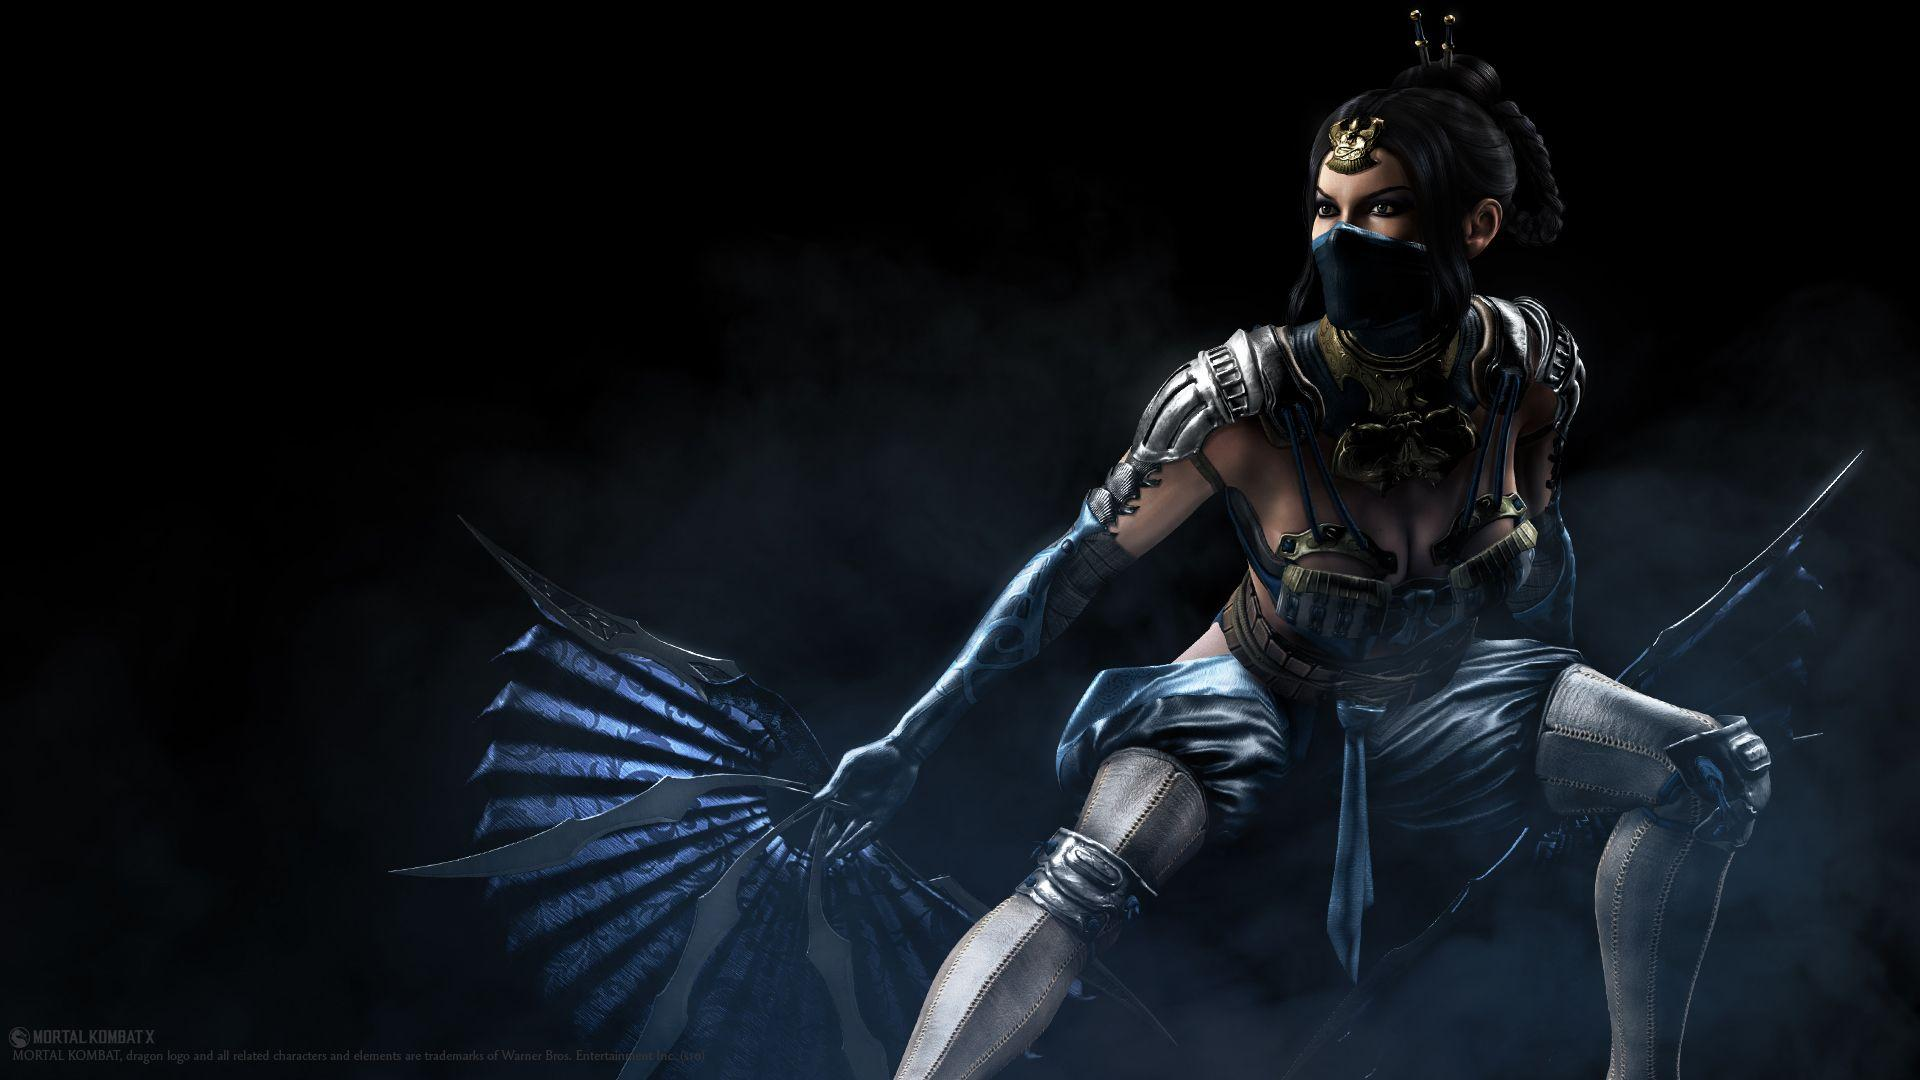 Mortal Kombat Female Characters Hd 3d Wallpapers Wallpaper Cave